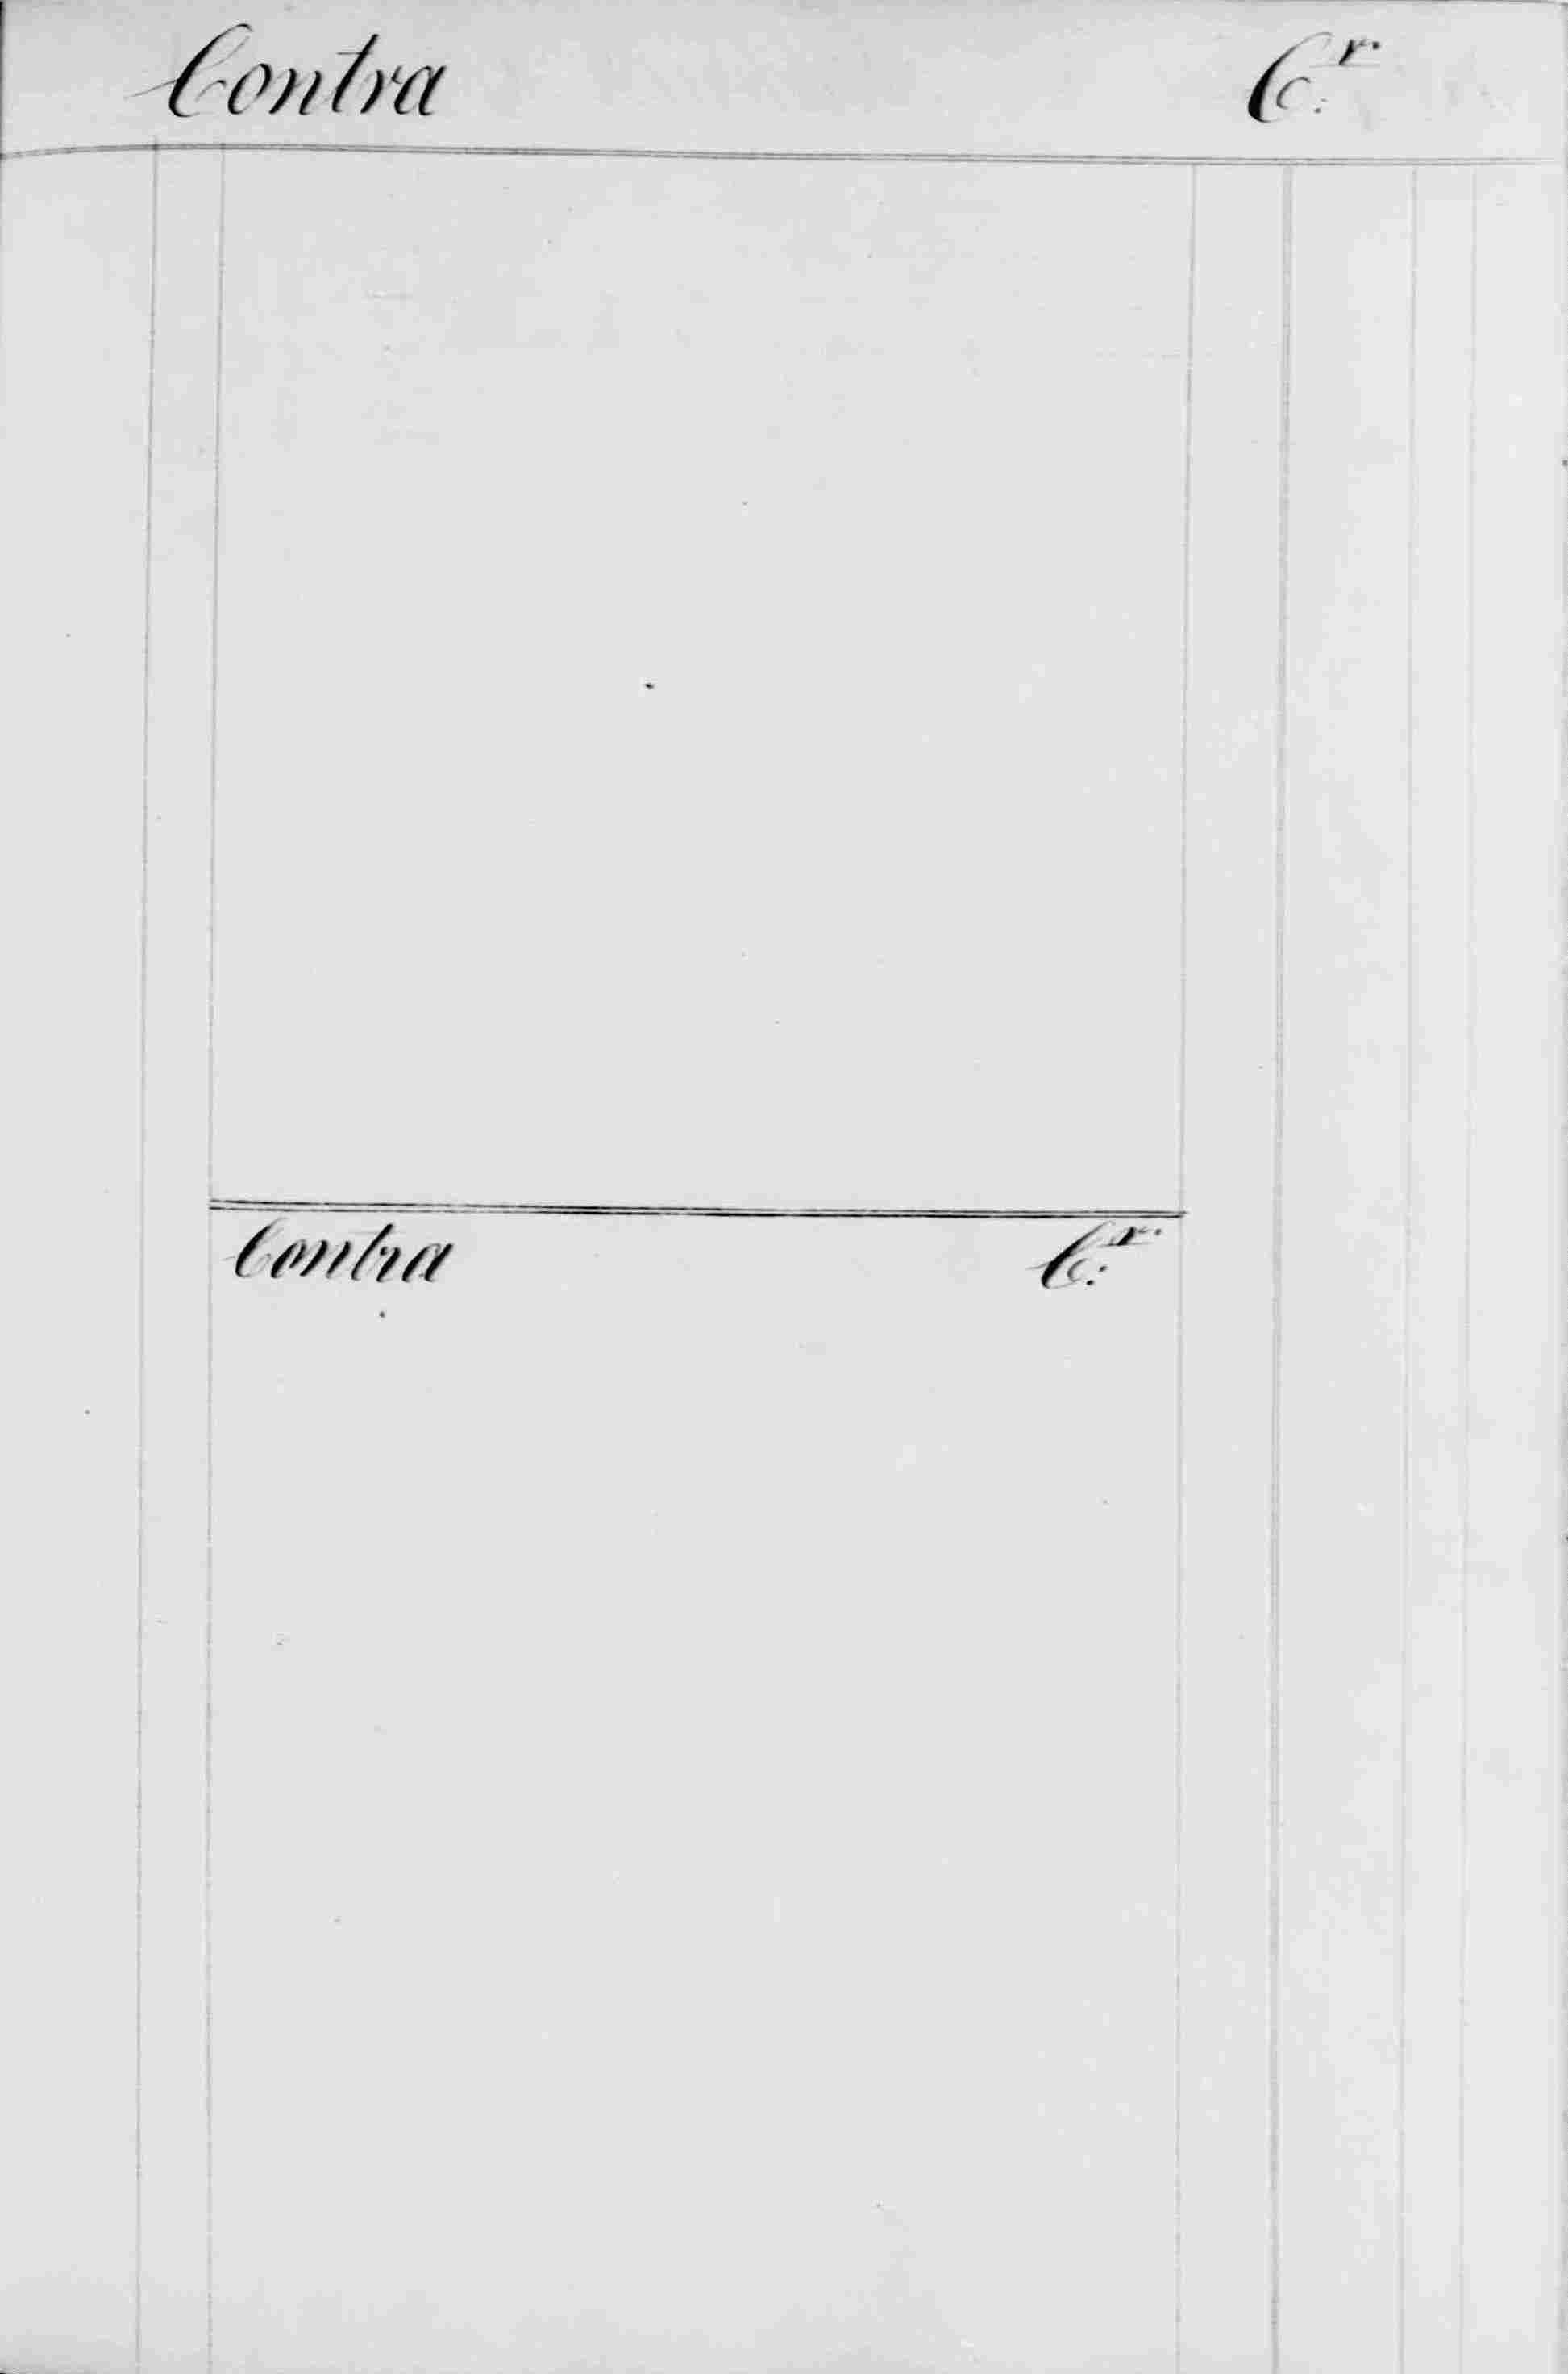 Ledger B, folio 286, right side